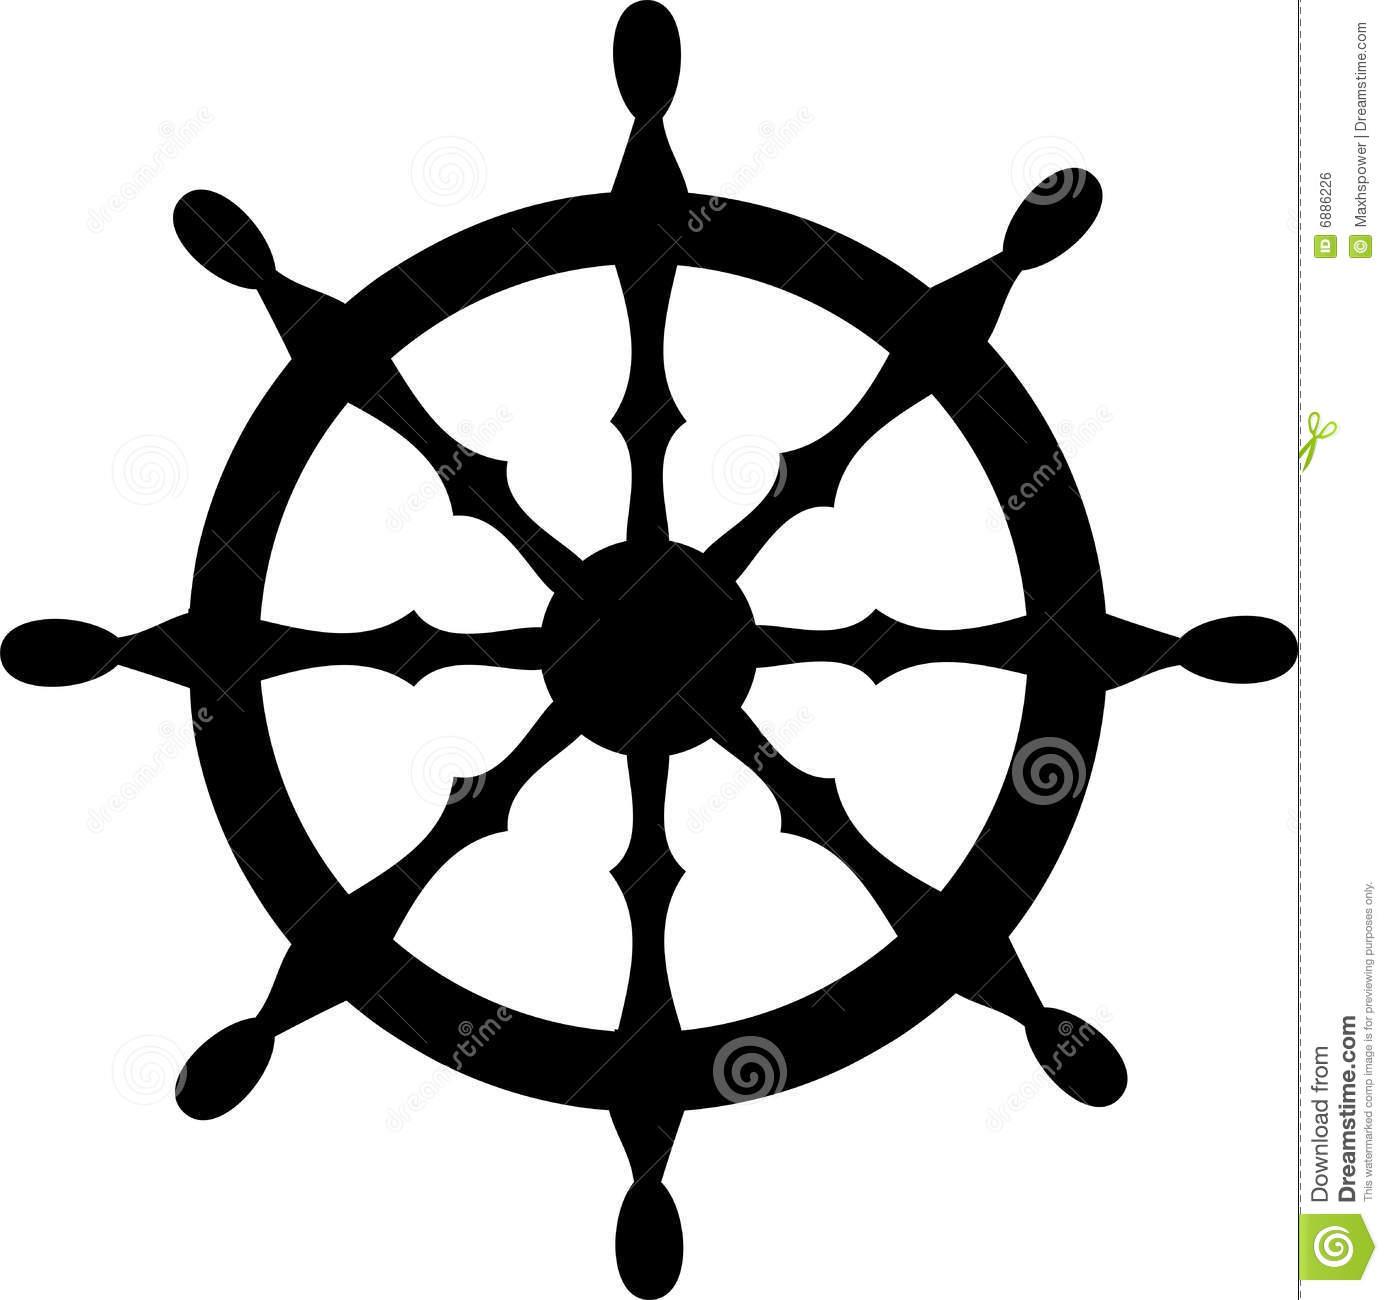 1388x1300 Boat Wheel Clipart 101 Clip Art